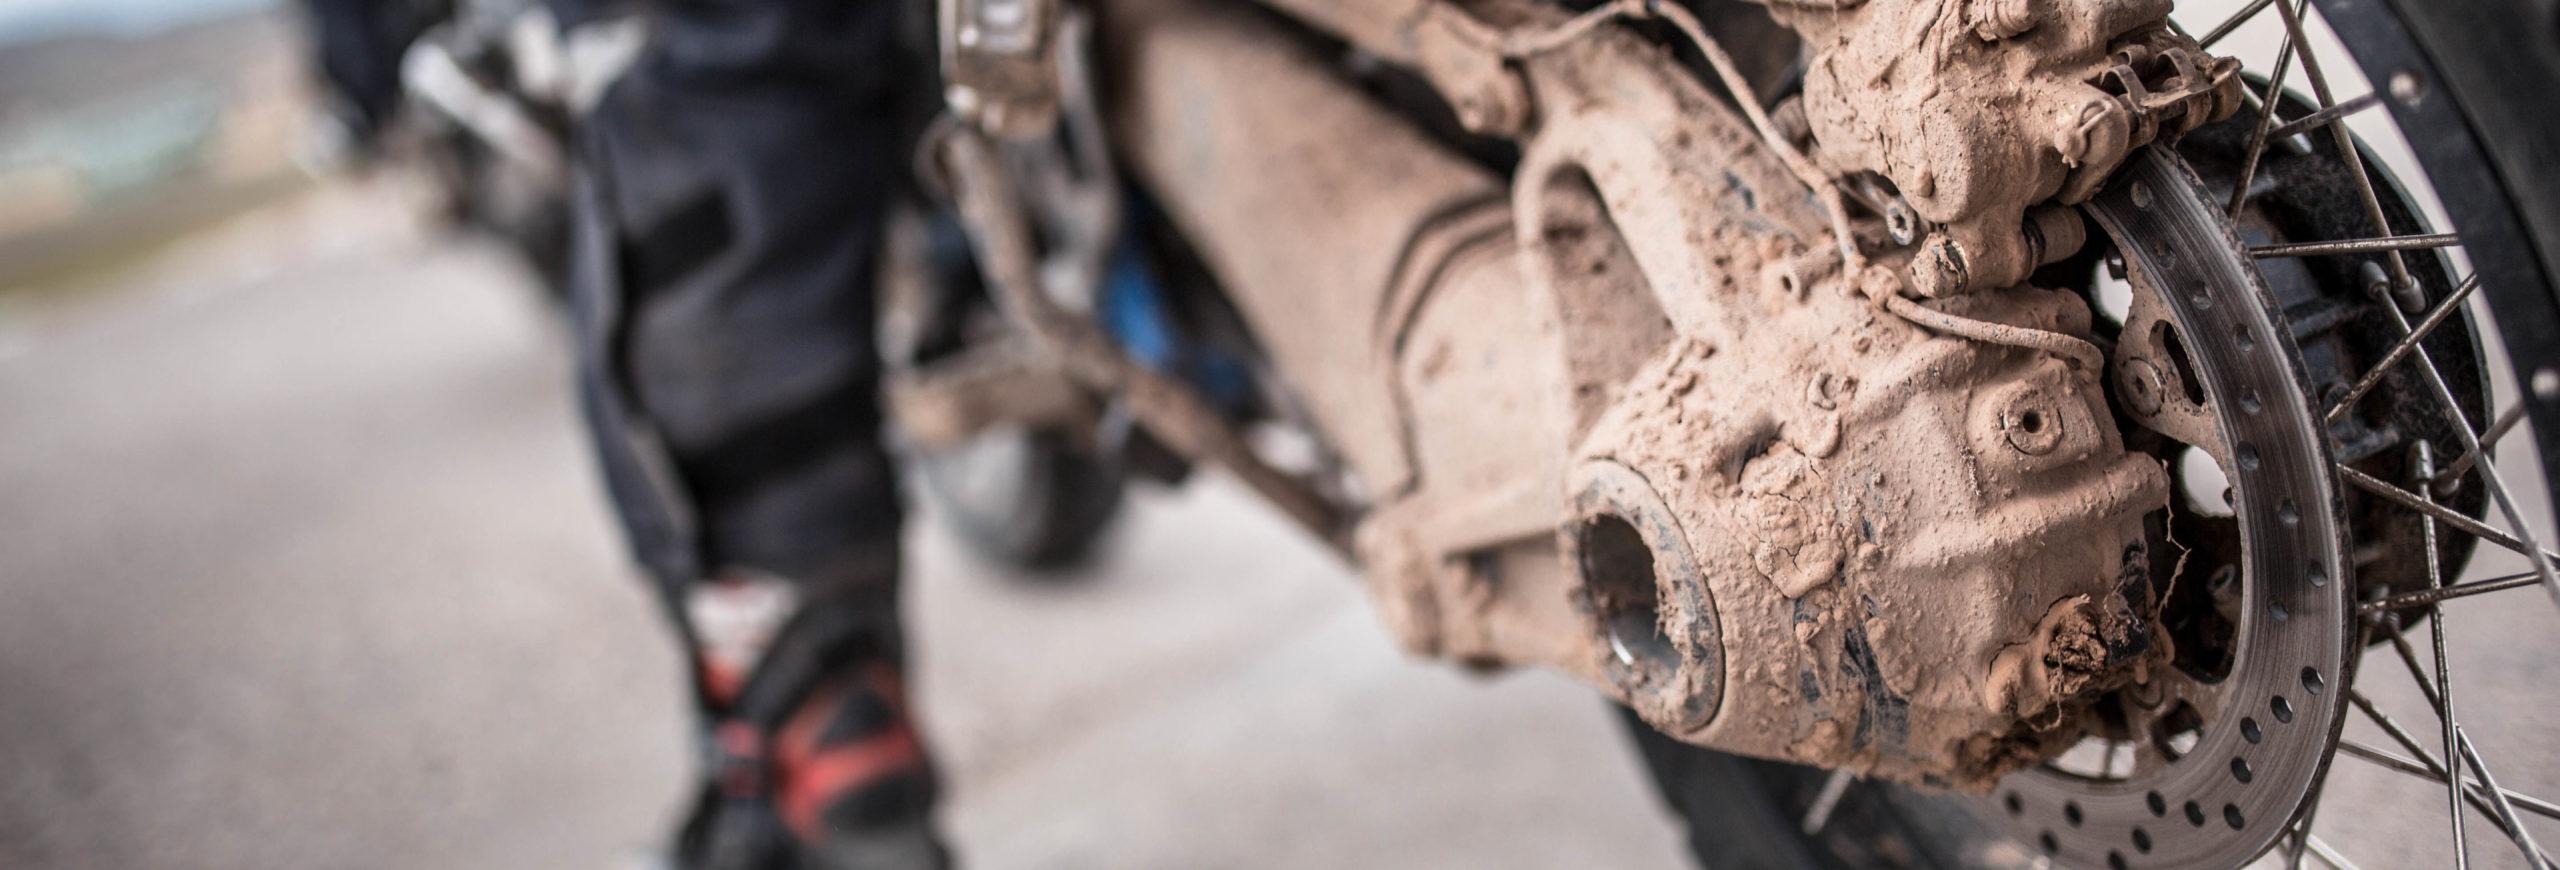 P90308579_highRes_bmw-motorrad-interna